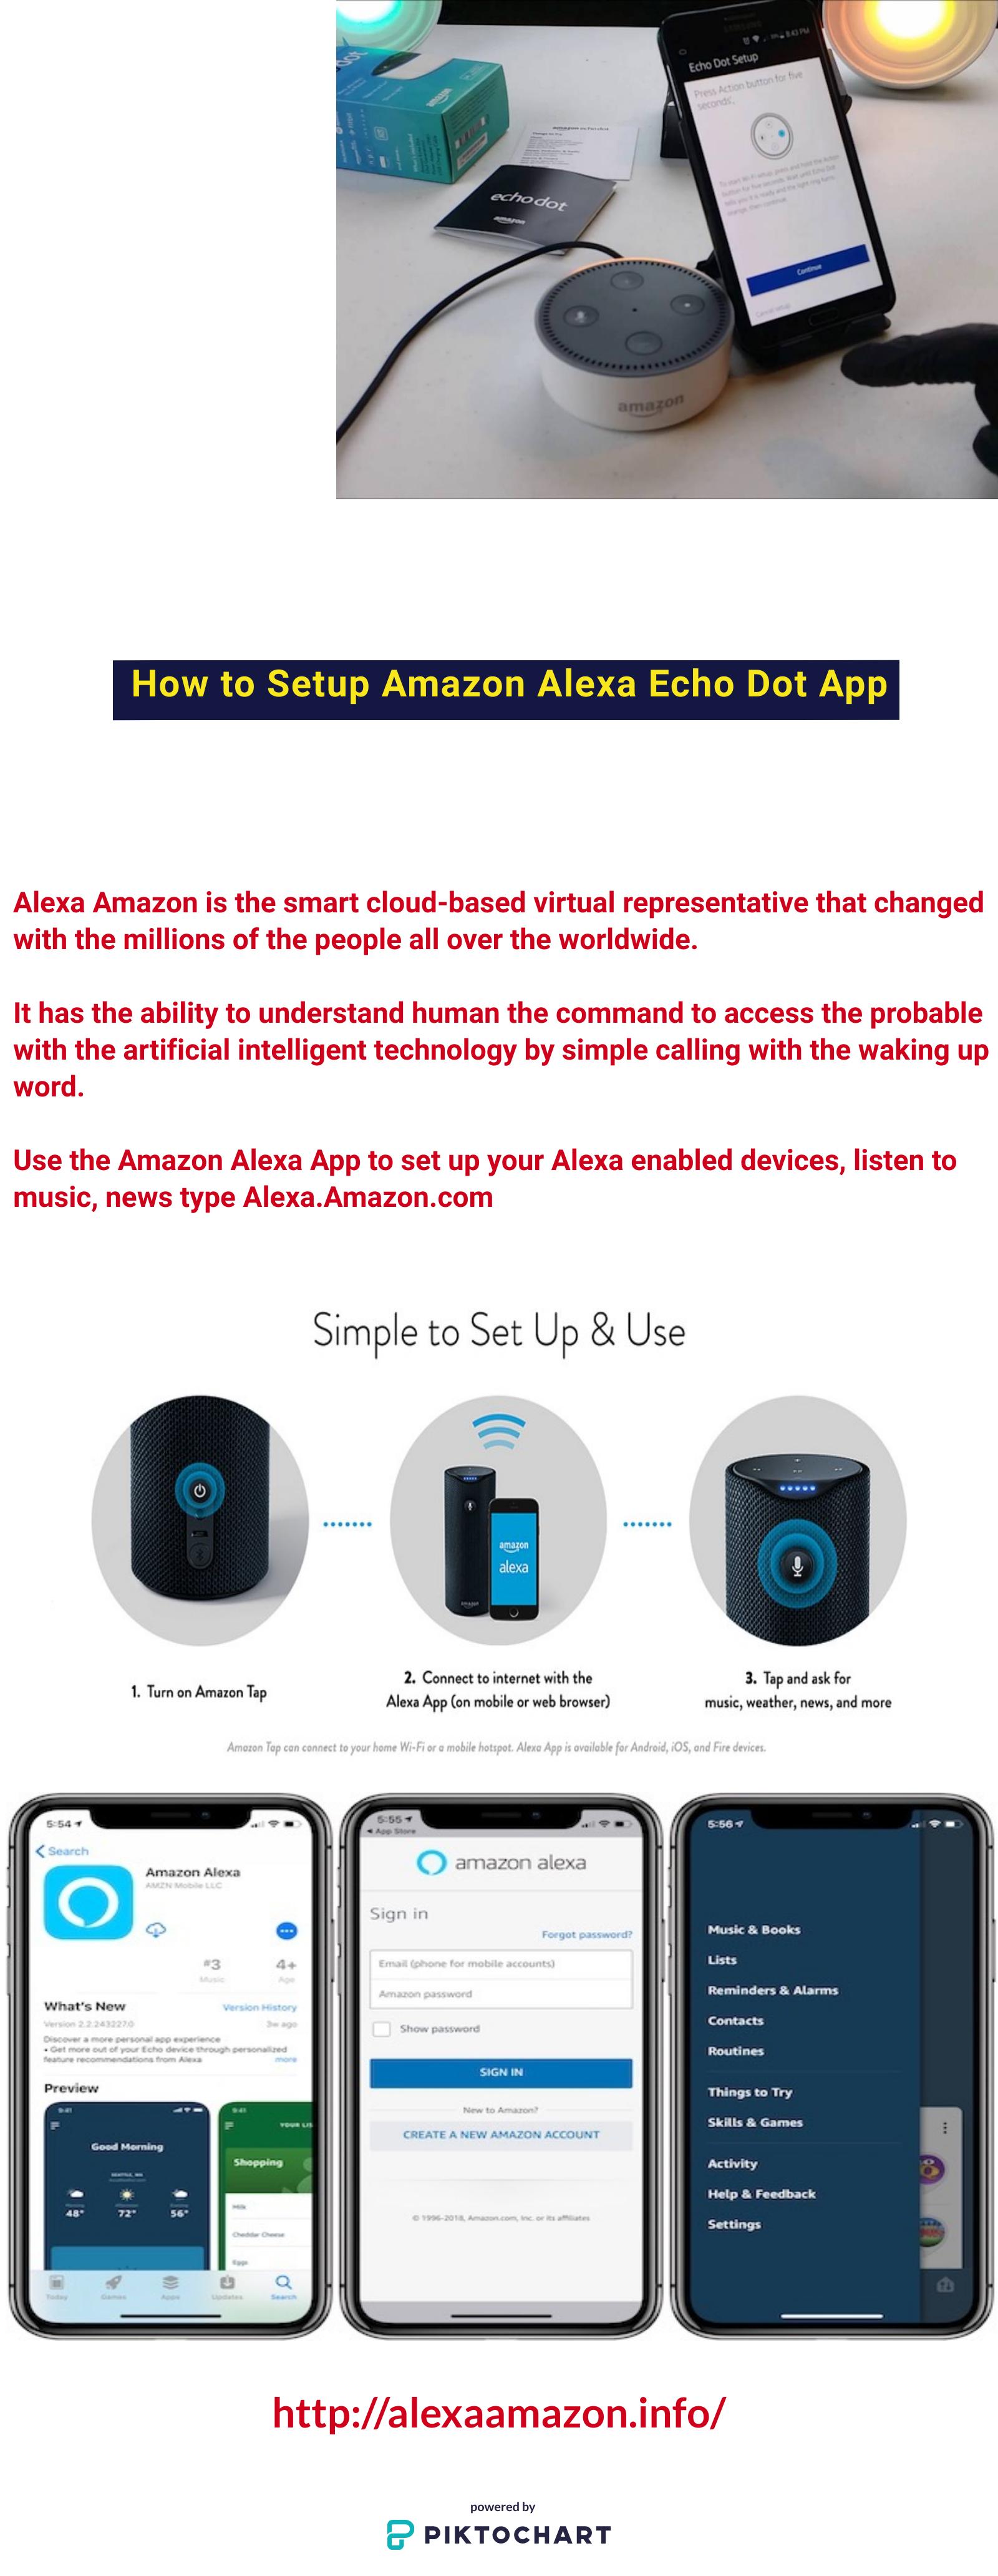 How To Setup Amazon Alexa Echo Dot App Amazon Alexa Echo Dot Dot App Alexa Echo